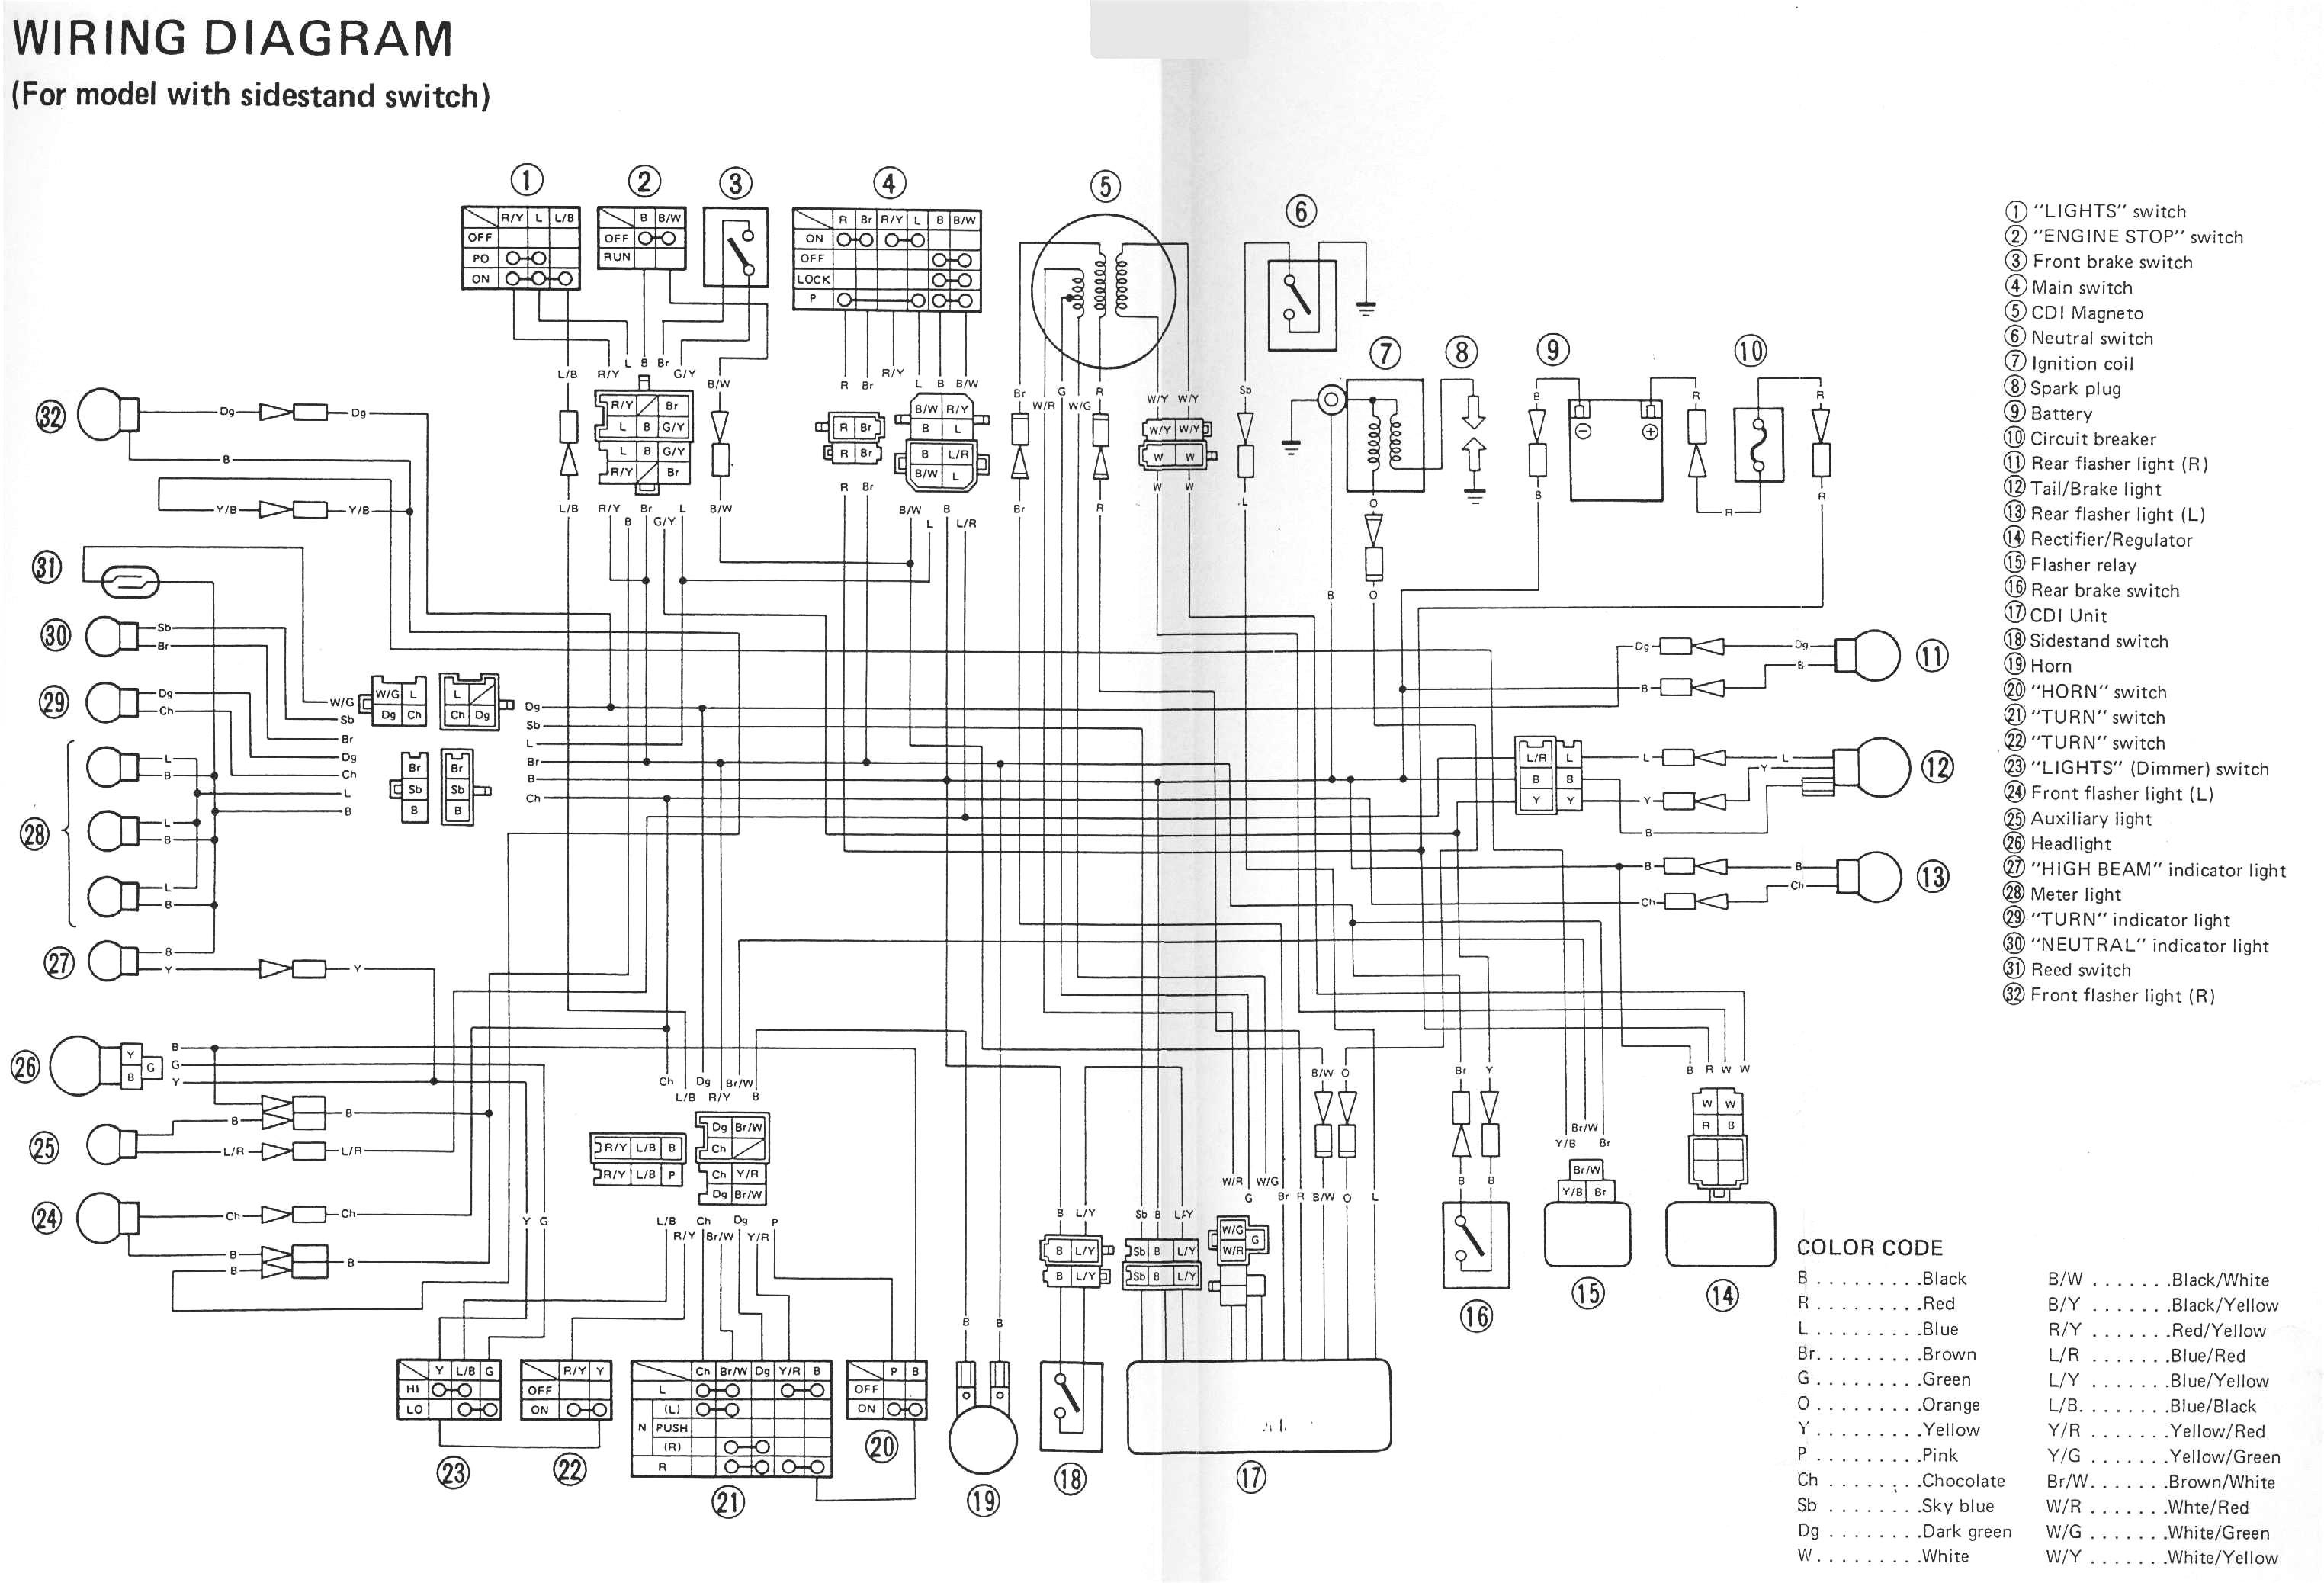 banshee wiring diagram awesome wiring diagram image rh mainetreasurechest com 110 Quad Wiring-Diagram Chinese ATV Wiring Diagrams